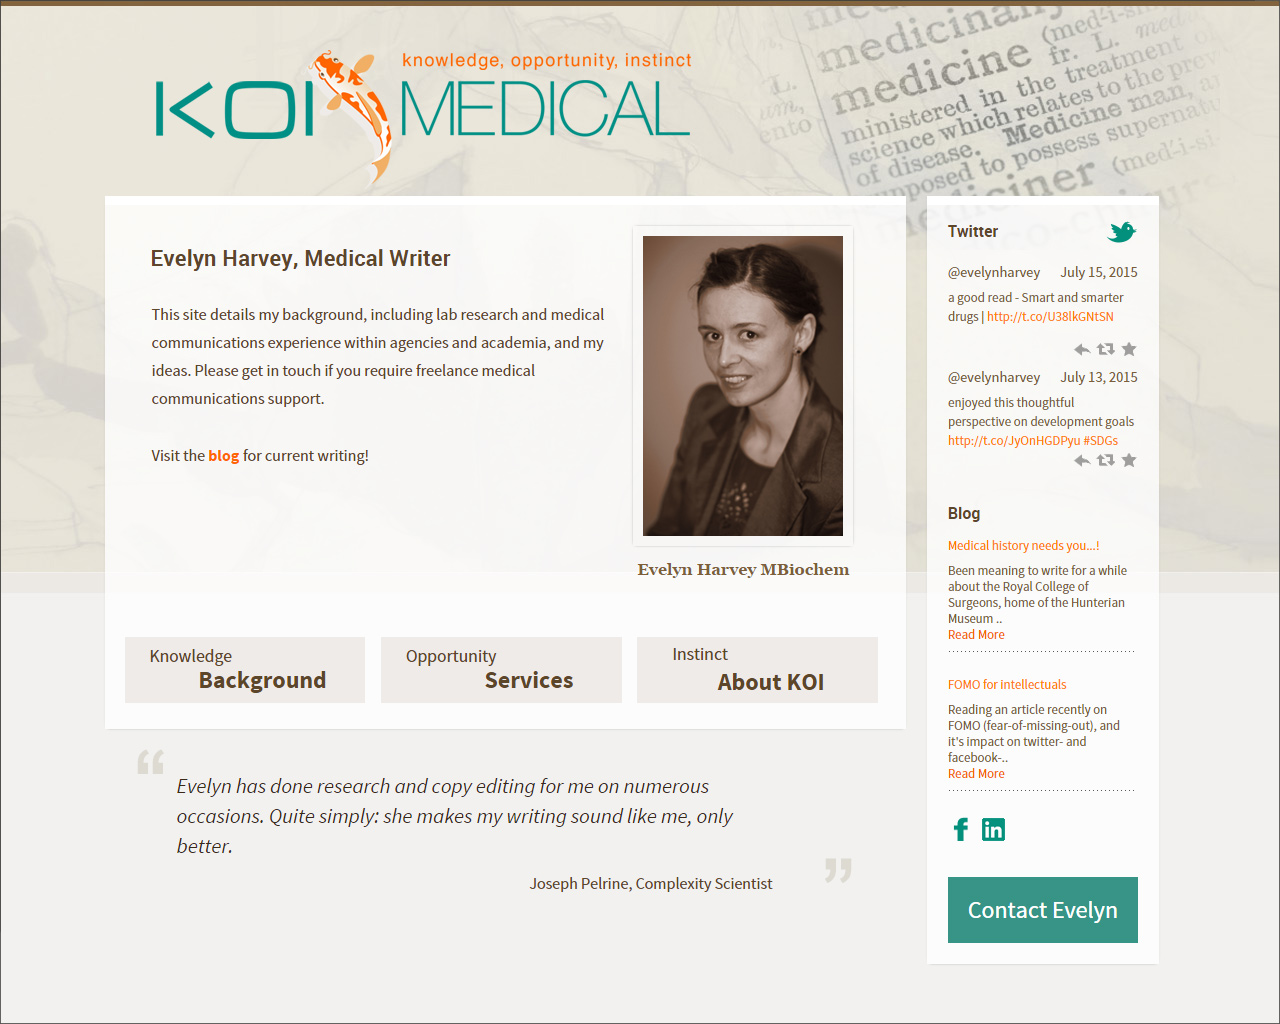 KOI medical